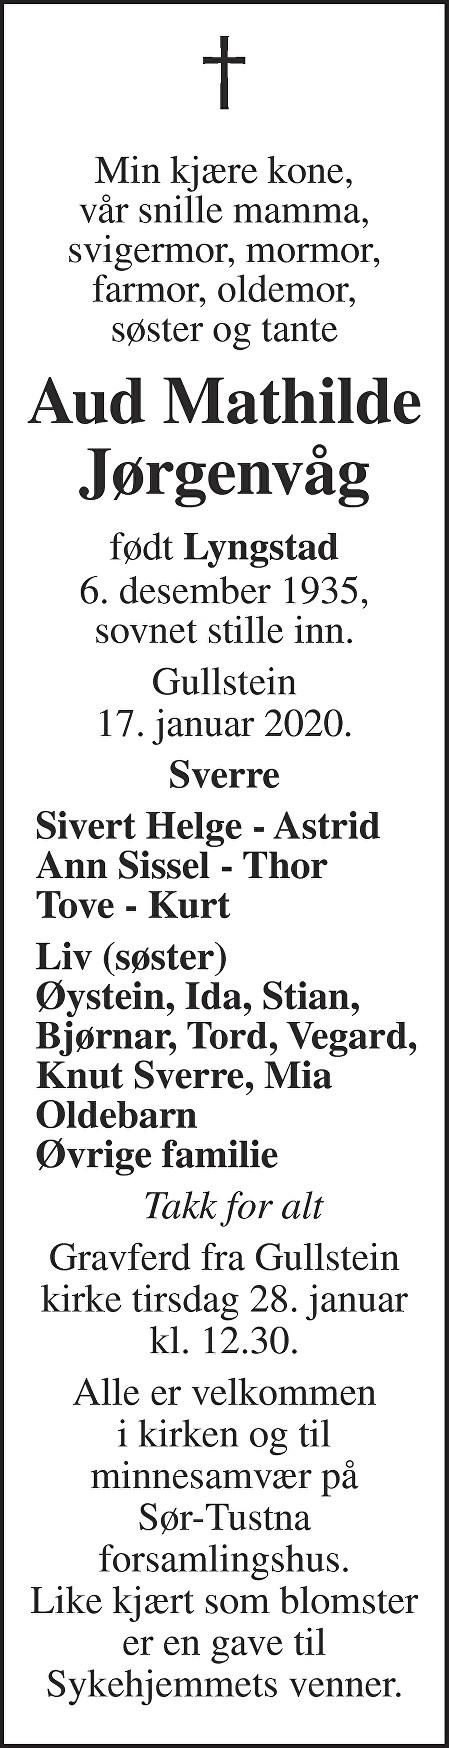 Aud Mathilde Jørgenvåg Dødsannonse